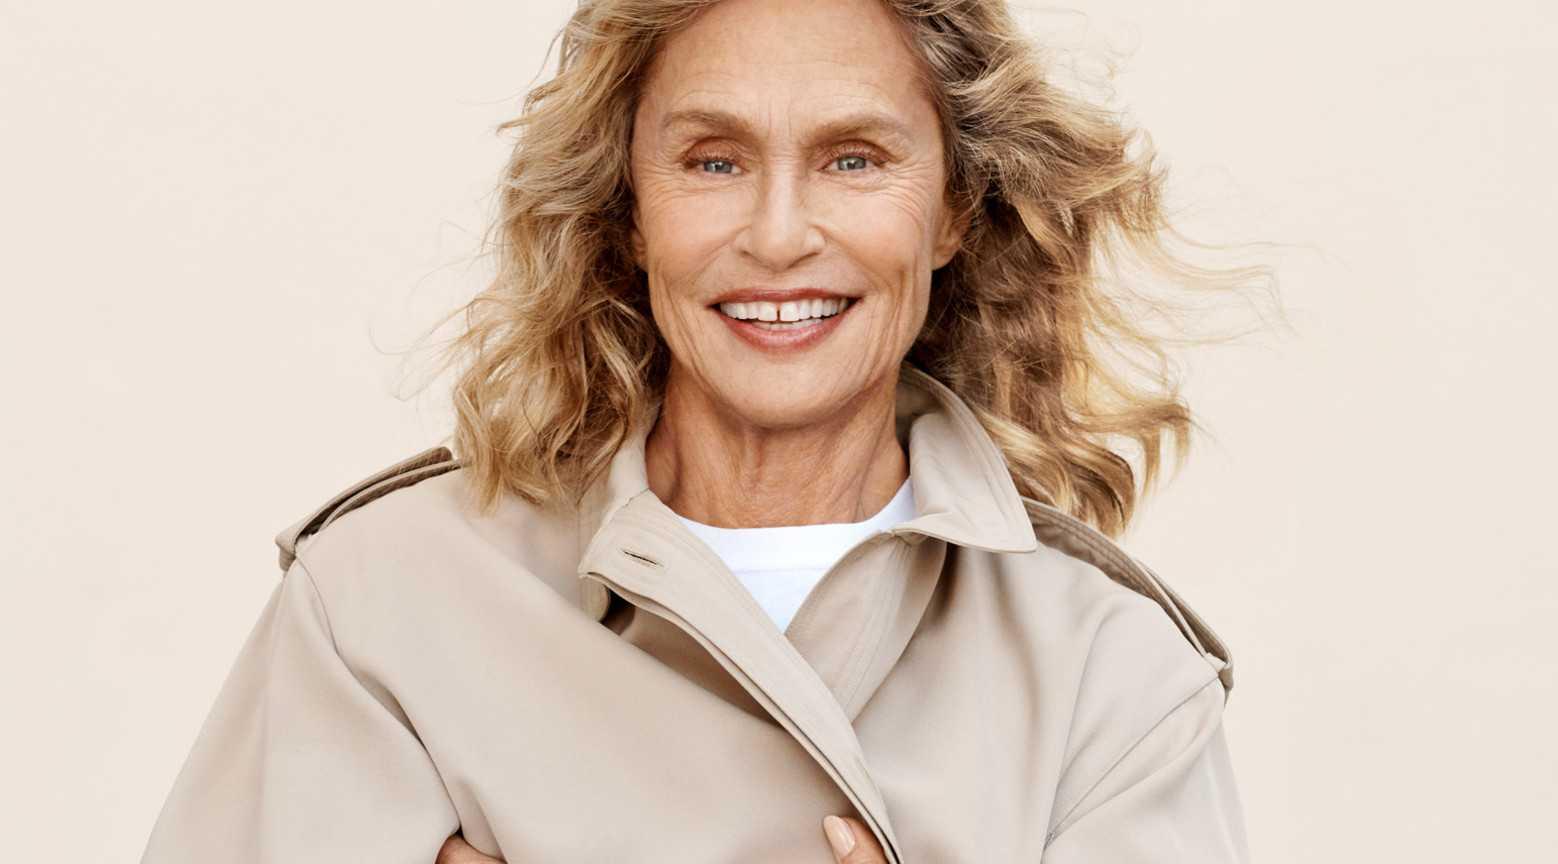 lauren-hutton-75-anos-novo-rosto-da-strivectin